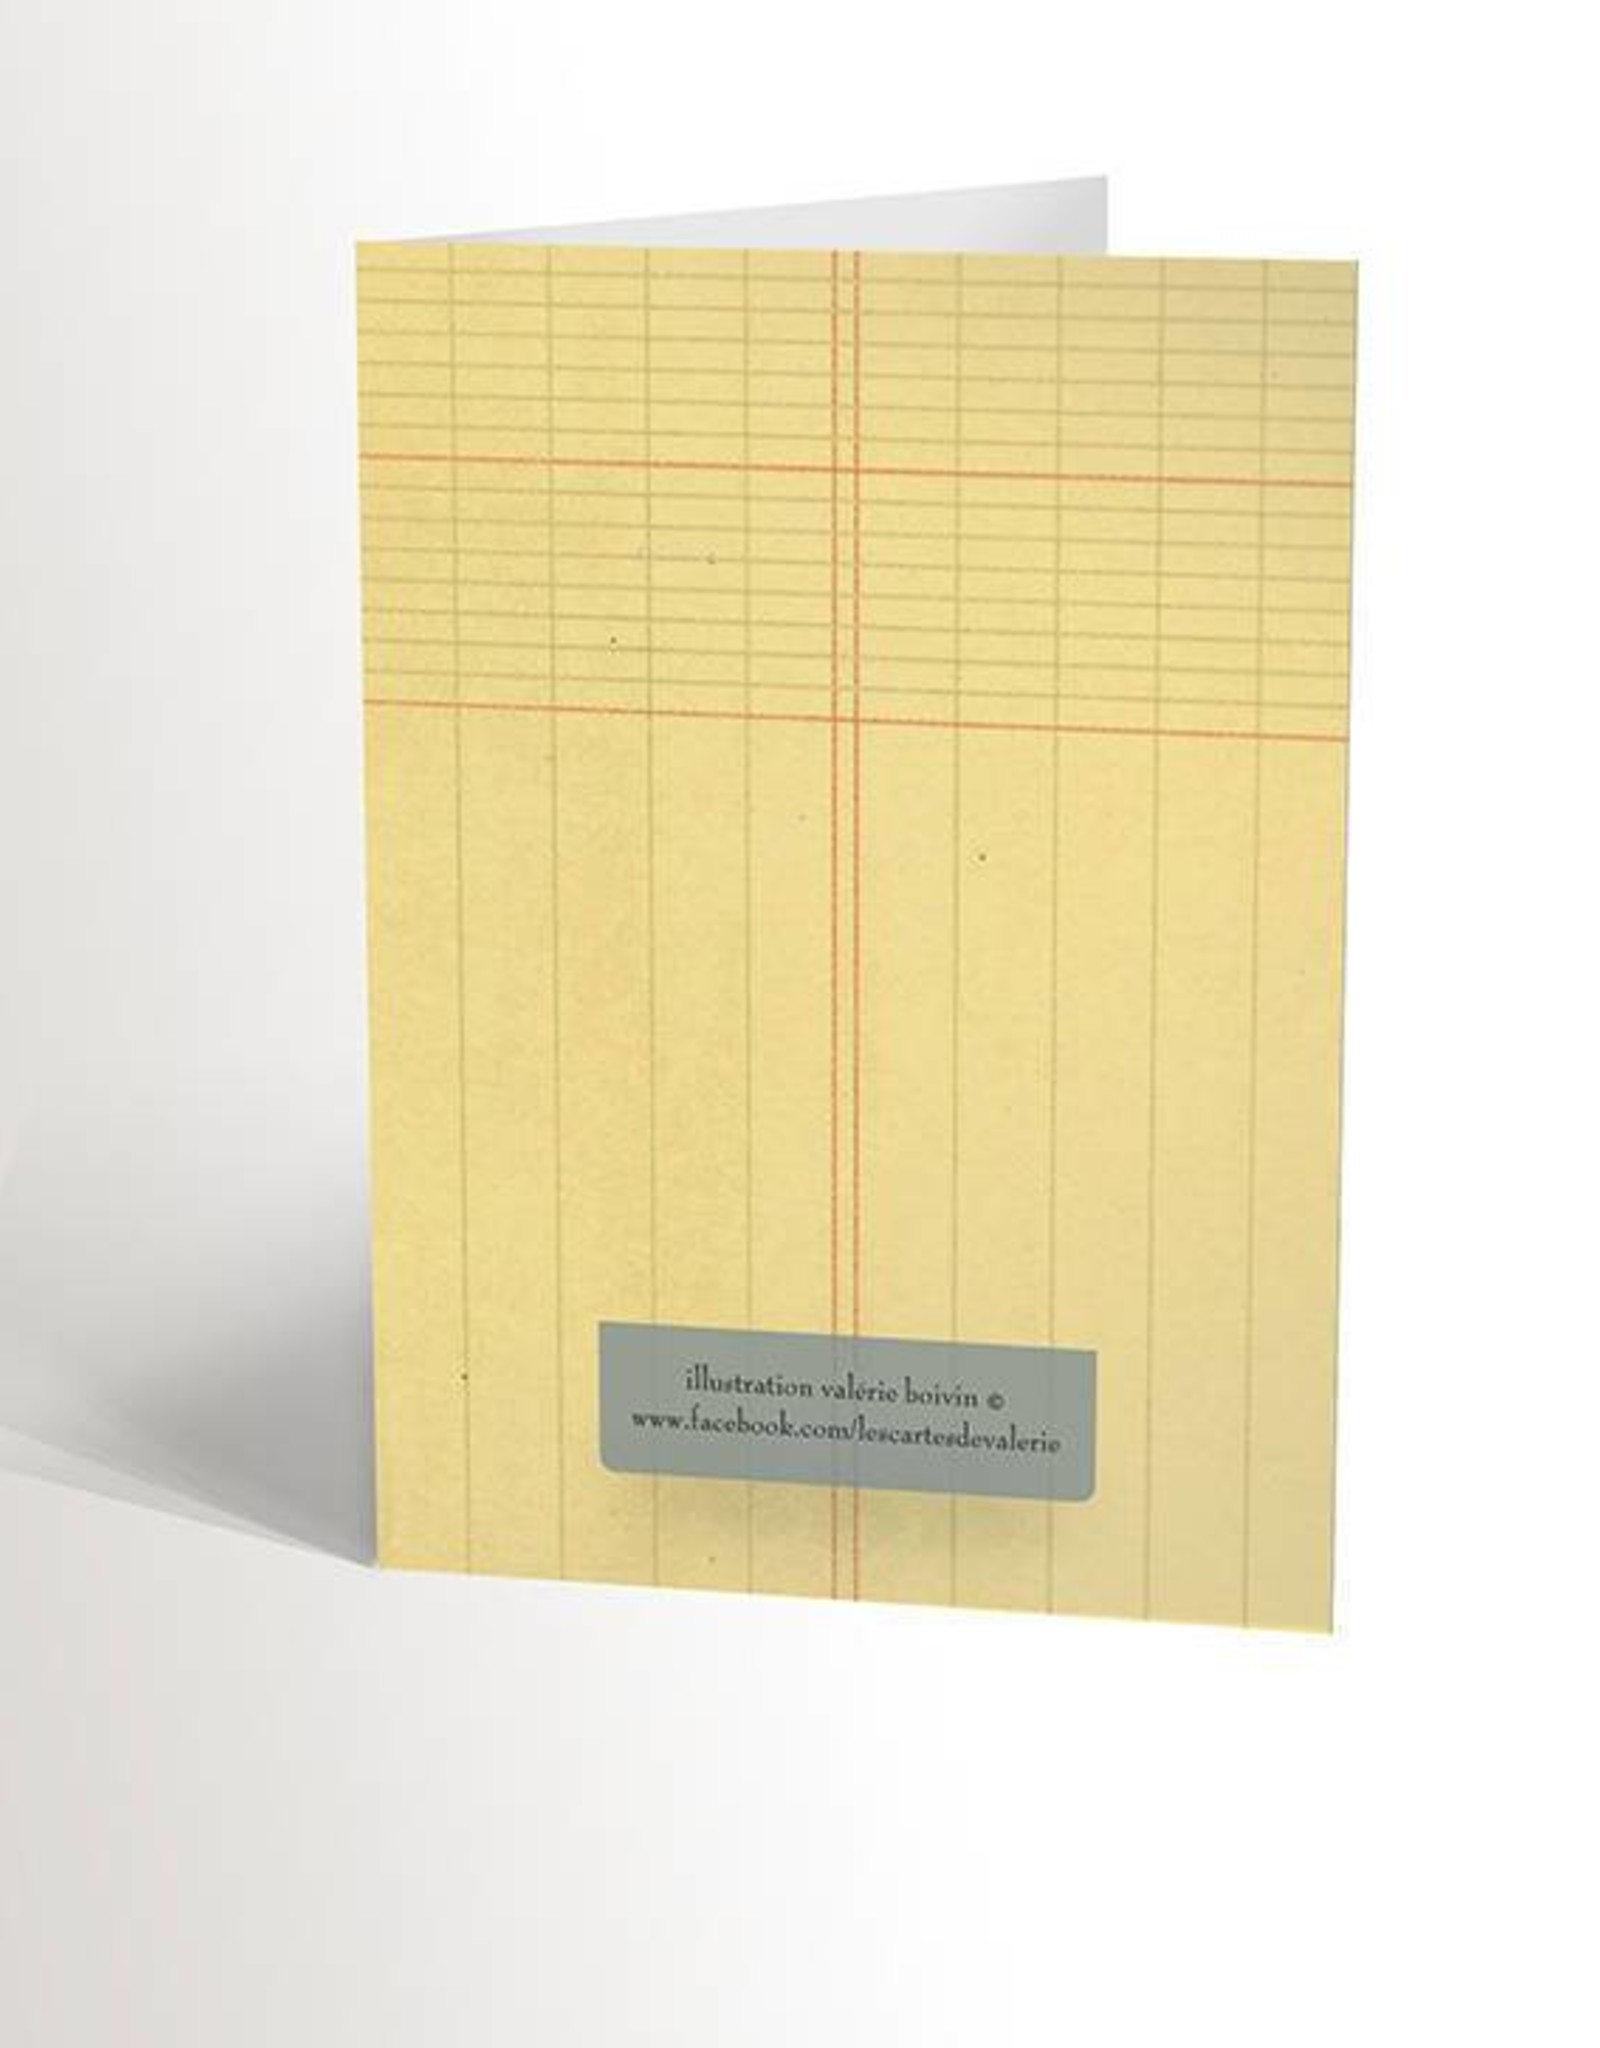 Valérie Boivin Illustrations Greeting Card - Blue Fox